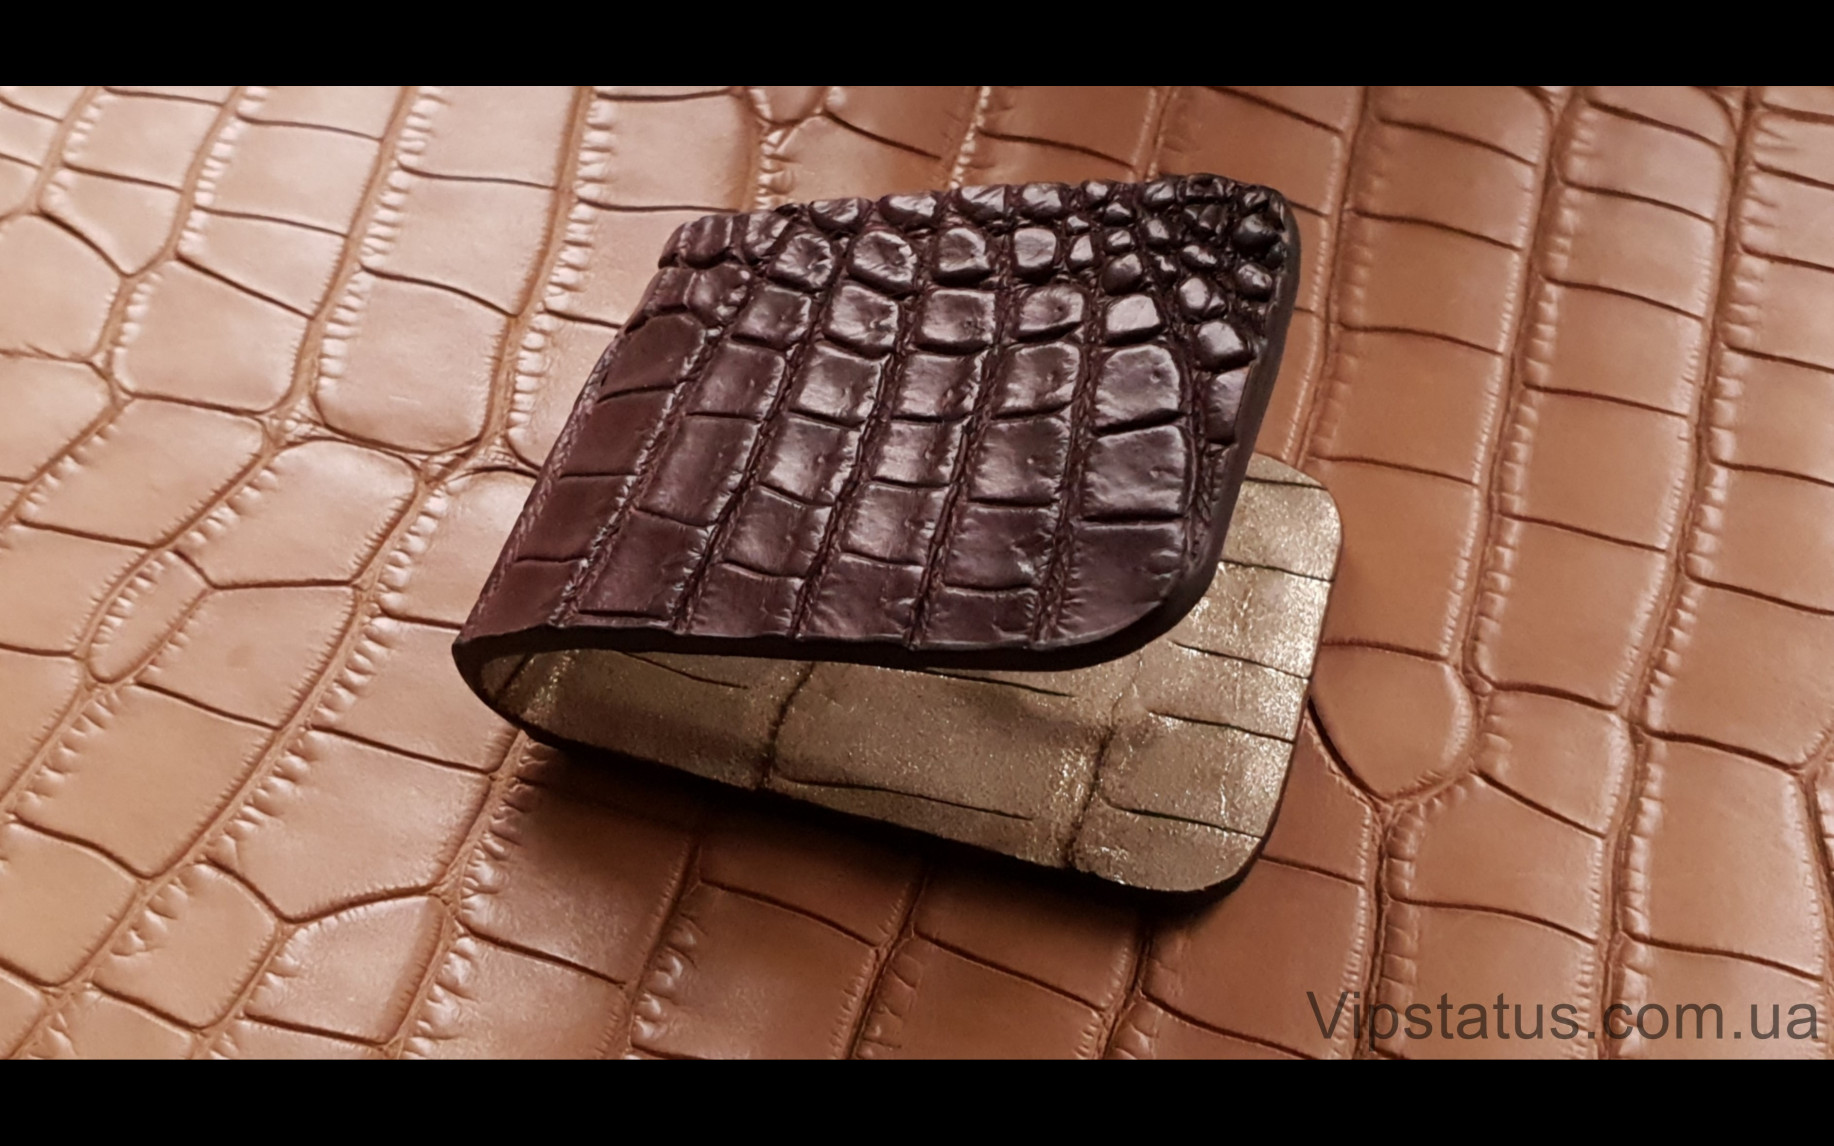 Elite Сhocolate Лакшери зажим для купюр Сhocolate Luxury bill clip image 1